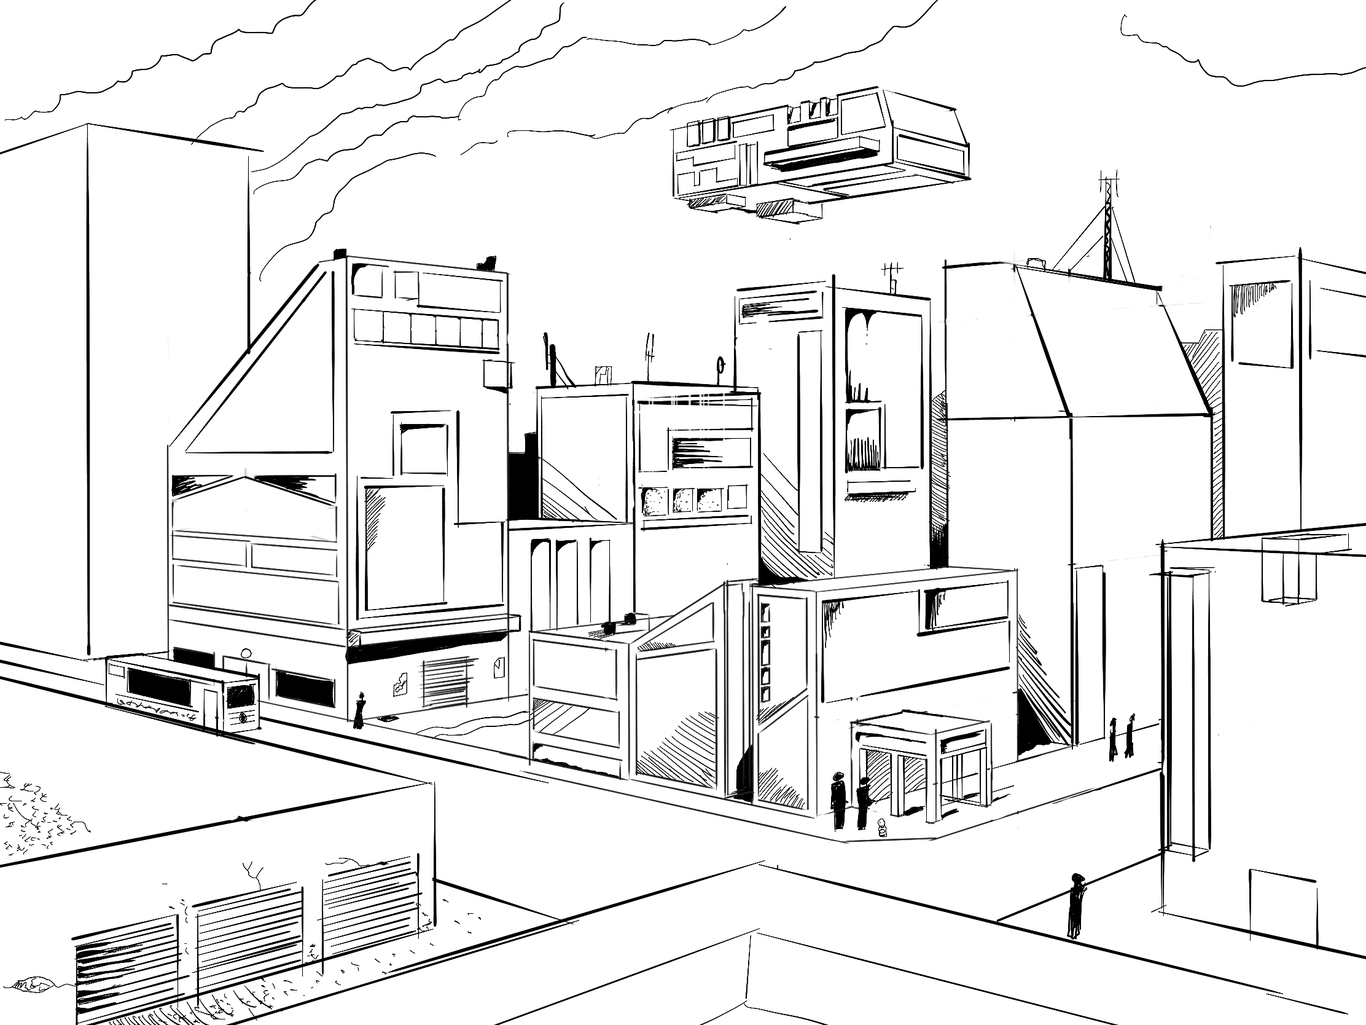 Mcwolfe futuristic city 1 464f8893 ao2q